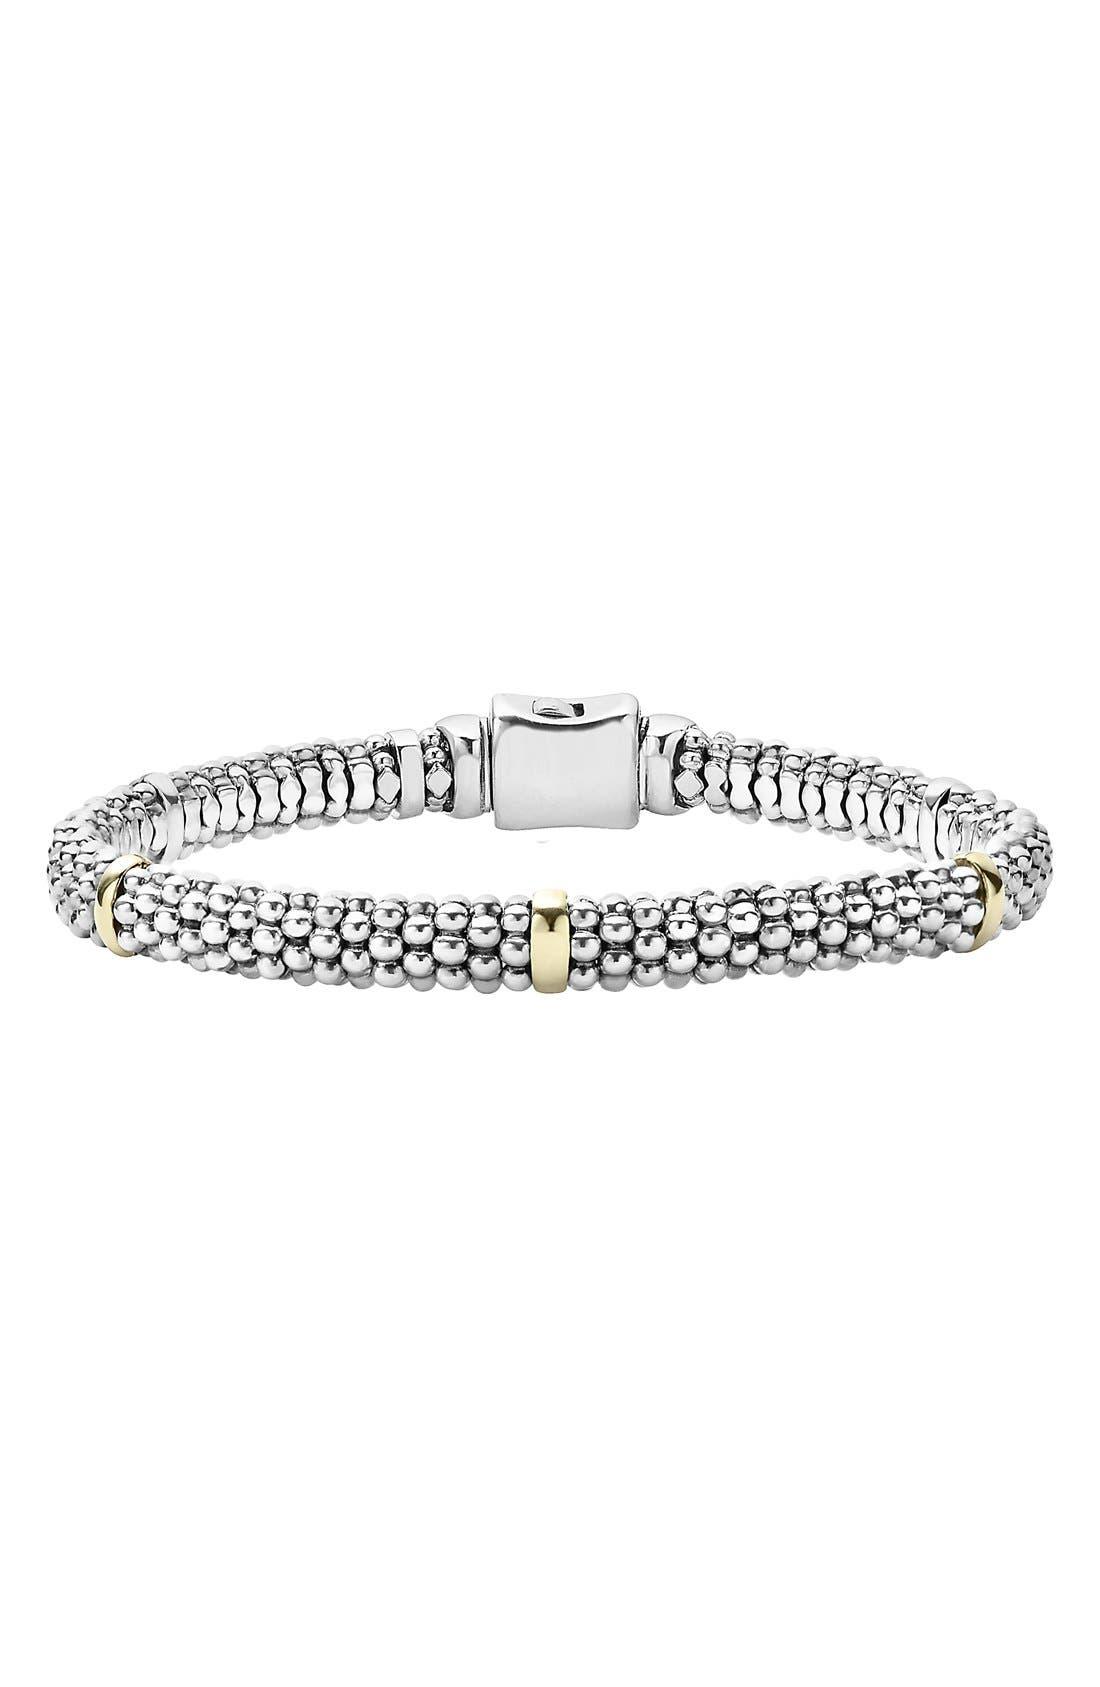 Main Image - LAGOS Caviar™ Rope Station Bracelet